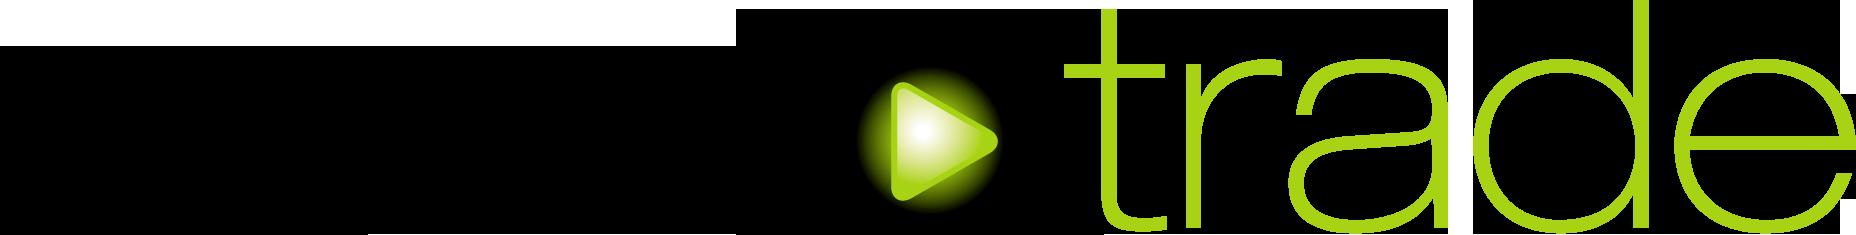 gps_kereso_logo